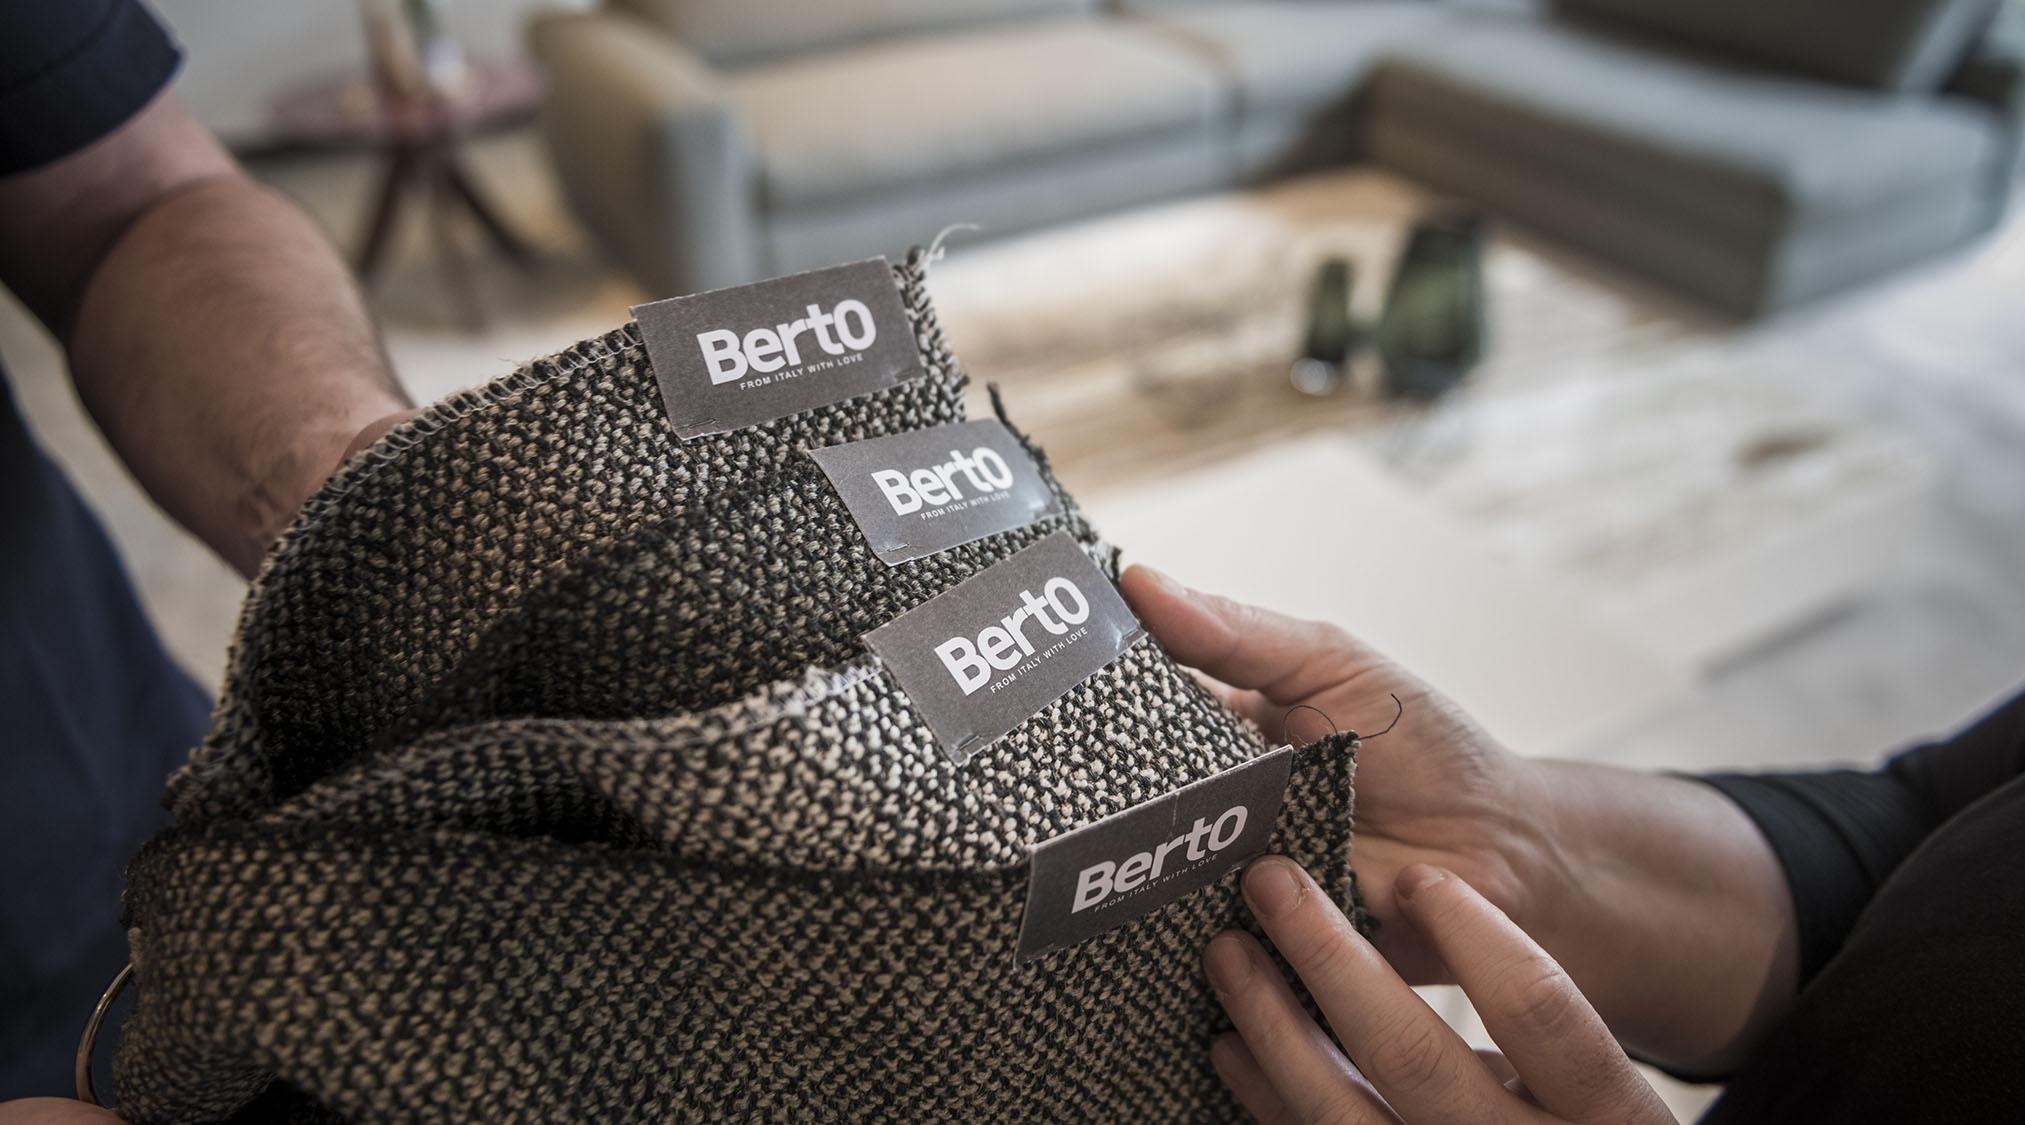 Berto Salotti梅达展纺织品系列